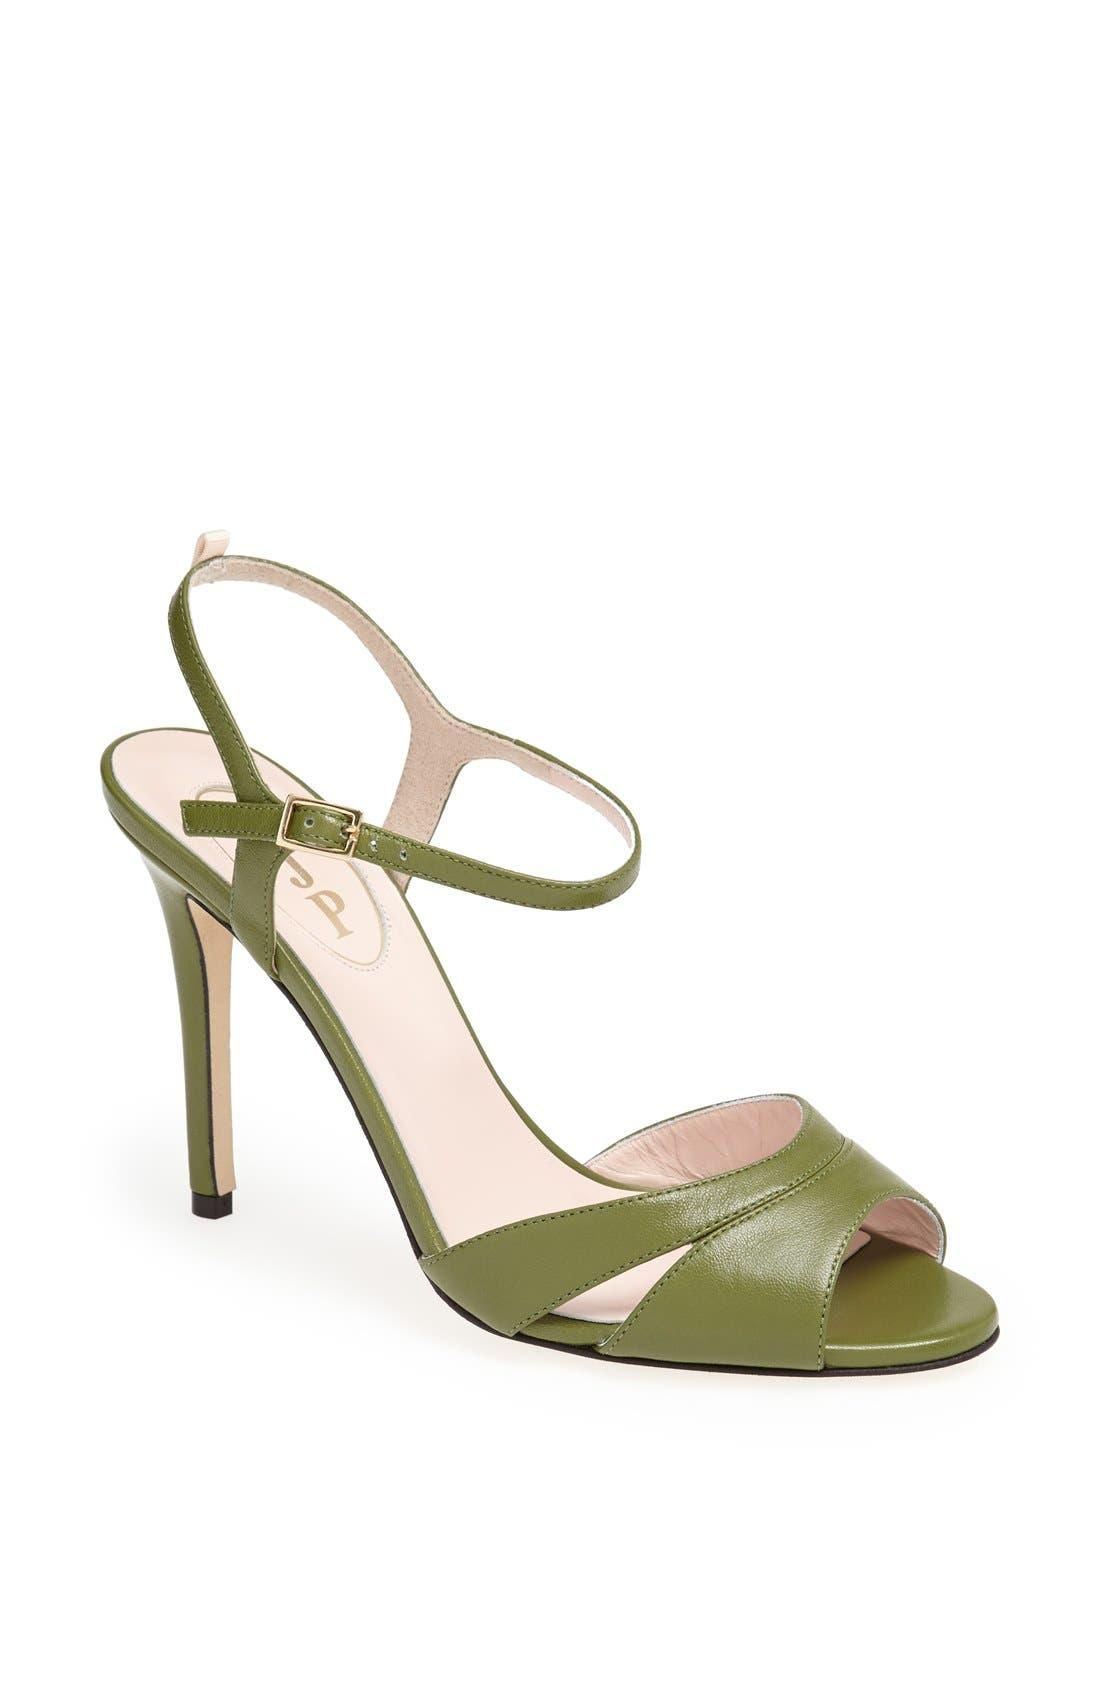 SJP 'Anna' Sandal,                             Main thumbnail 1, color,                             Green